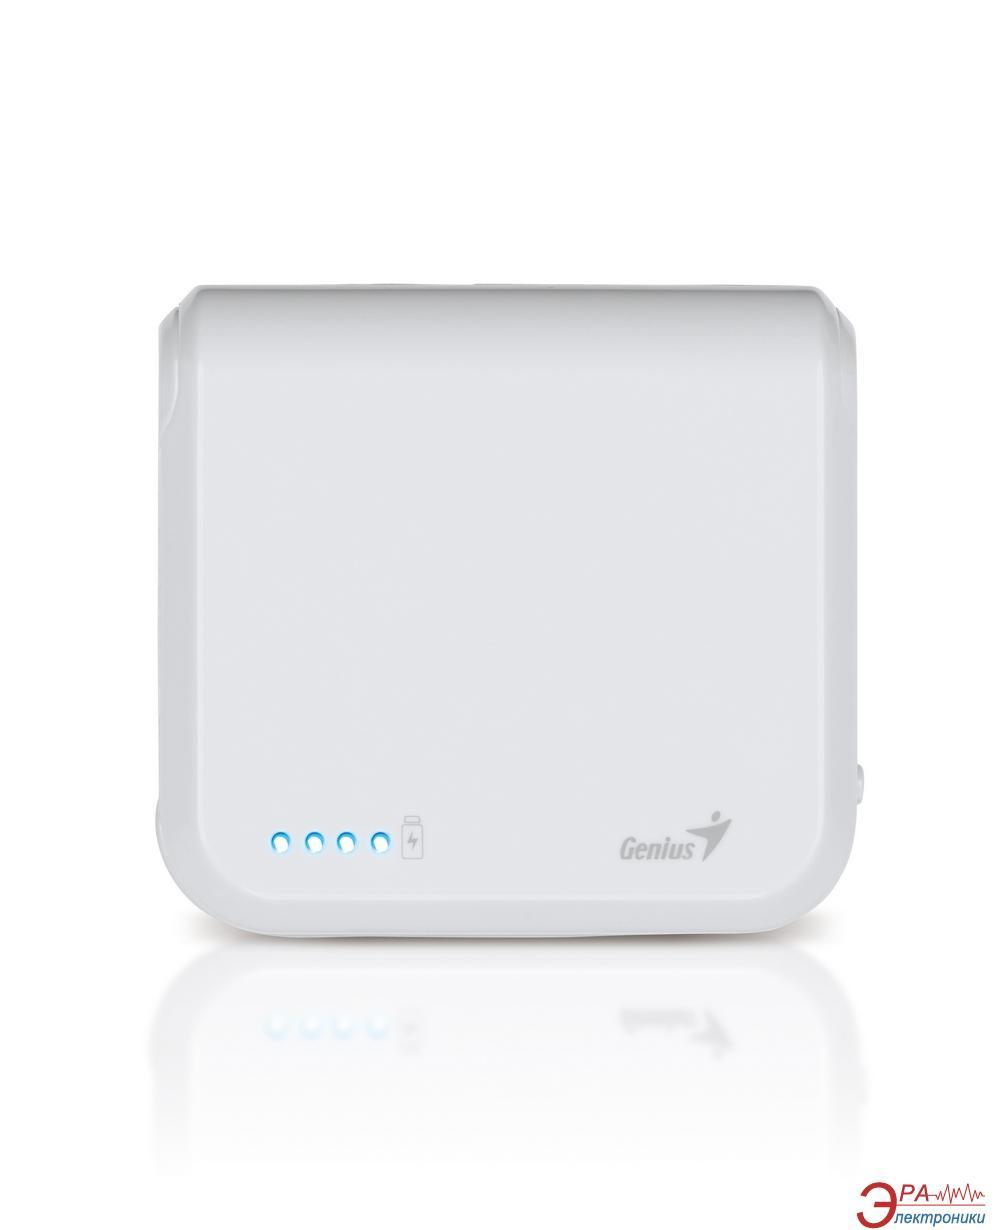 Внешний аккумулятор (PowerBank) Genius ECO-u500 White (39800001102)